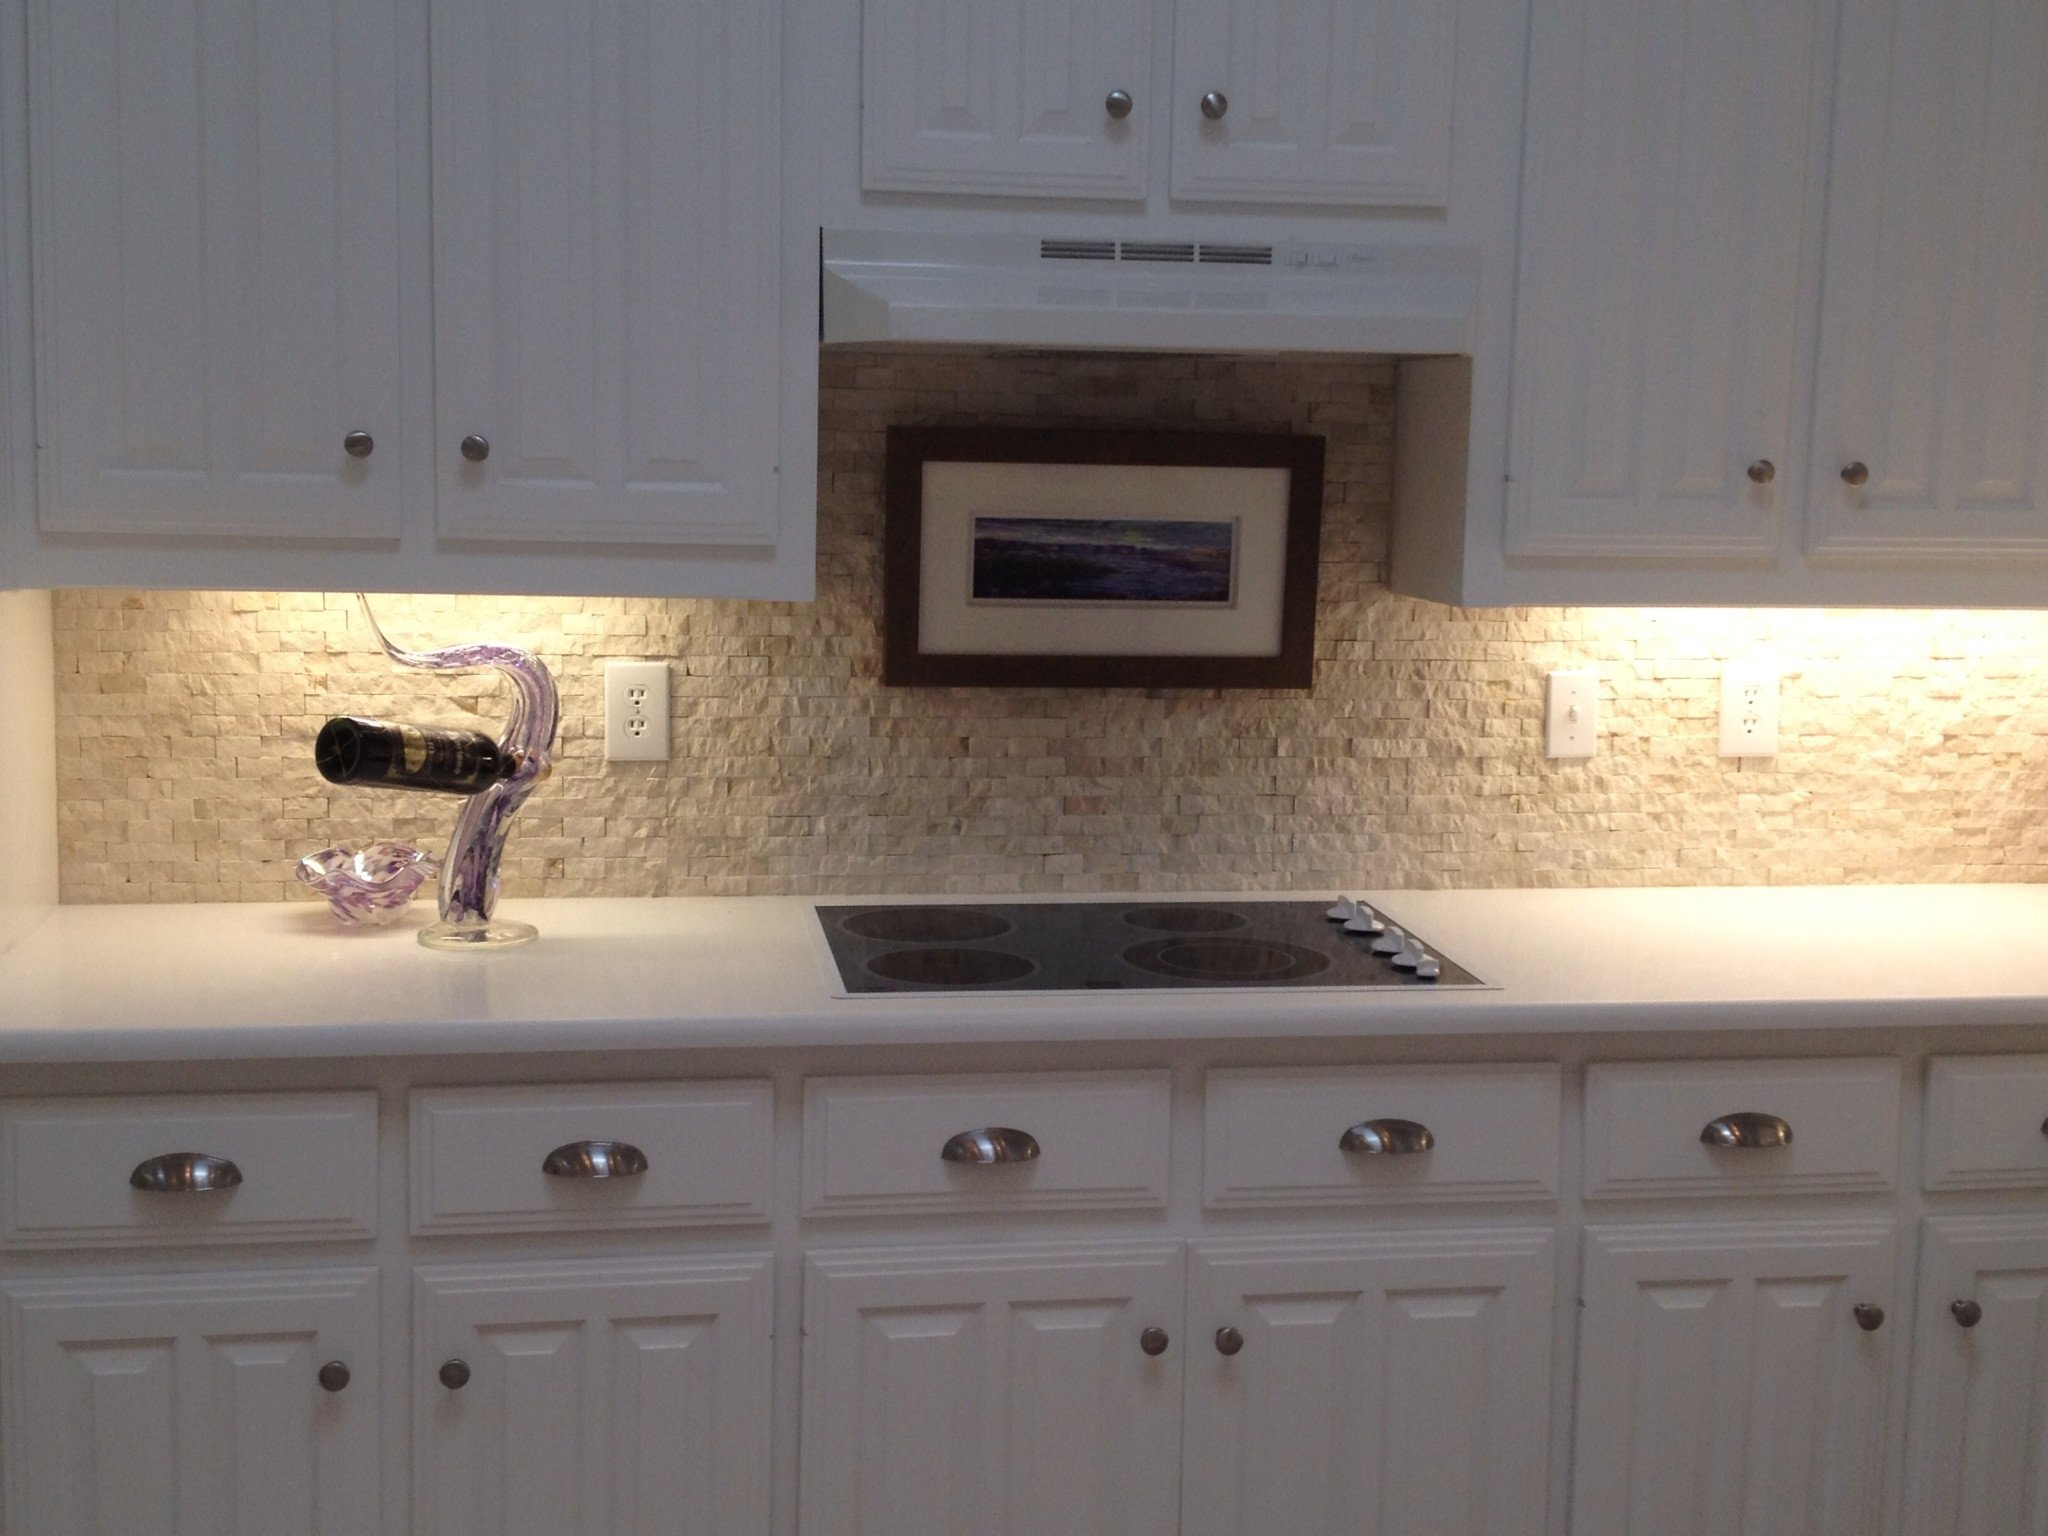 Floor and Decor Kitchen Backsplash New Stone Backsplash atr Floors and Decoratr Floors and Decor